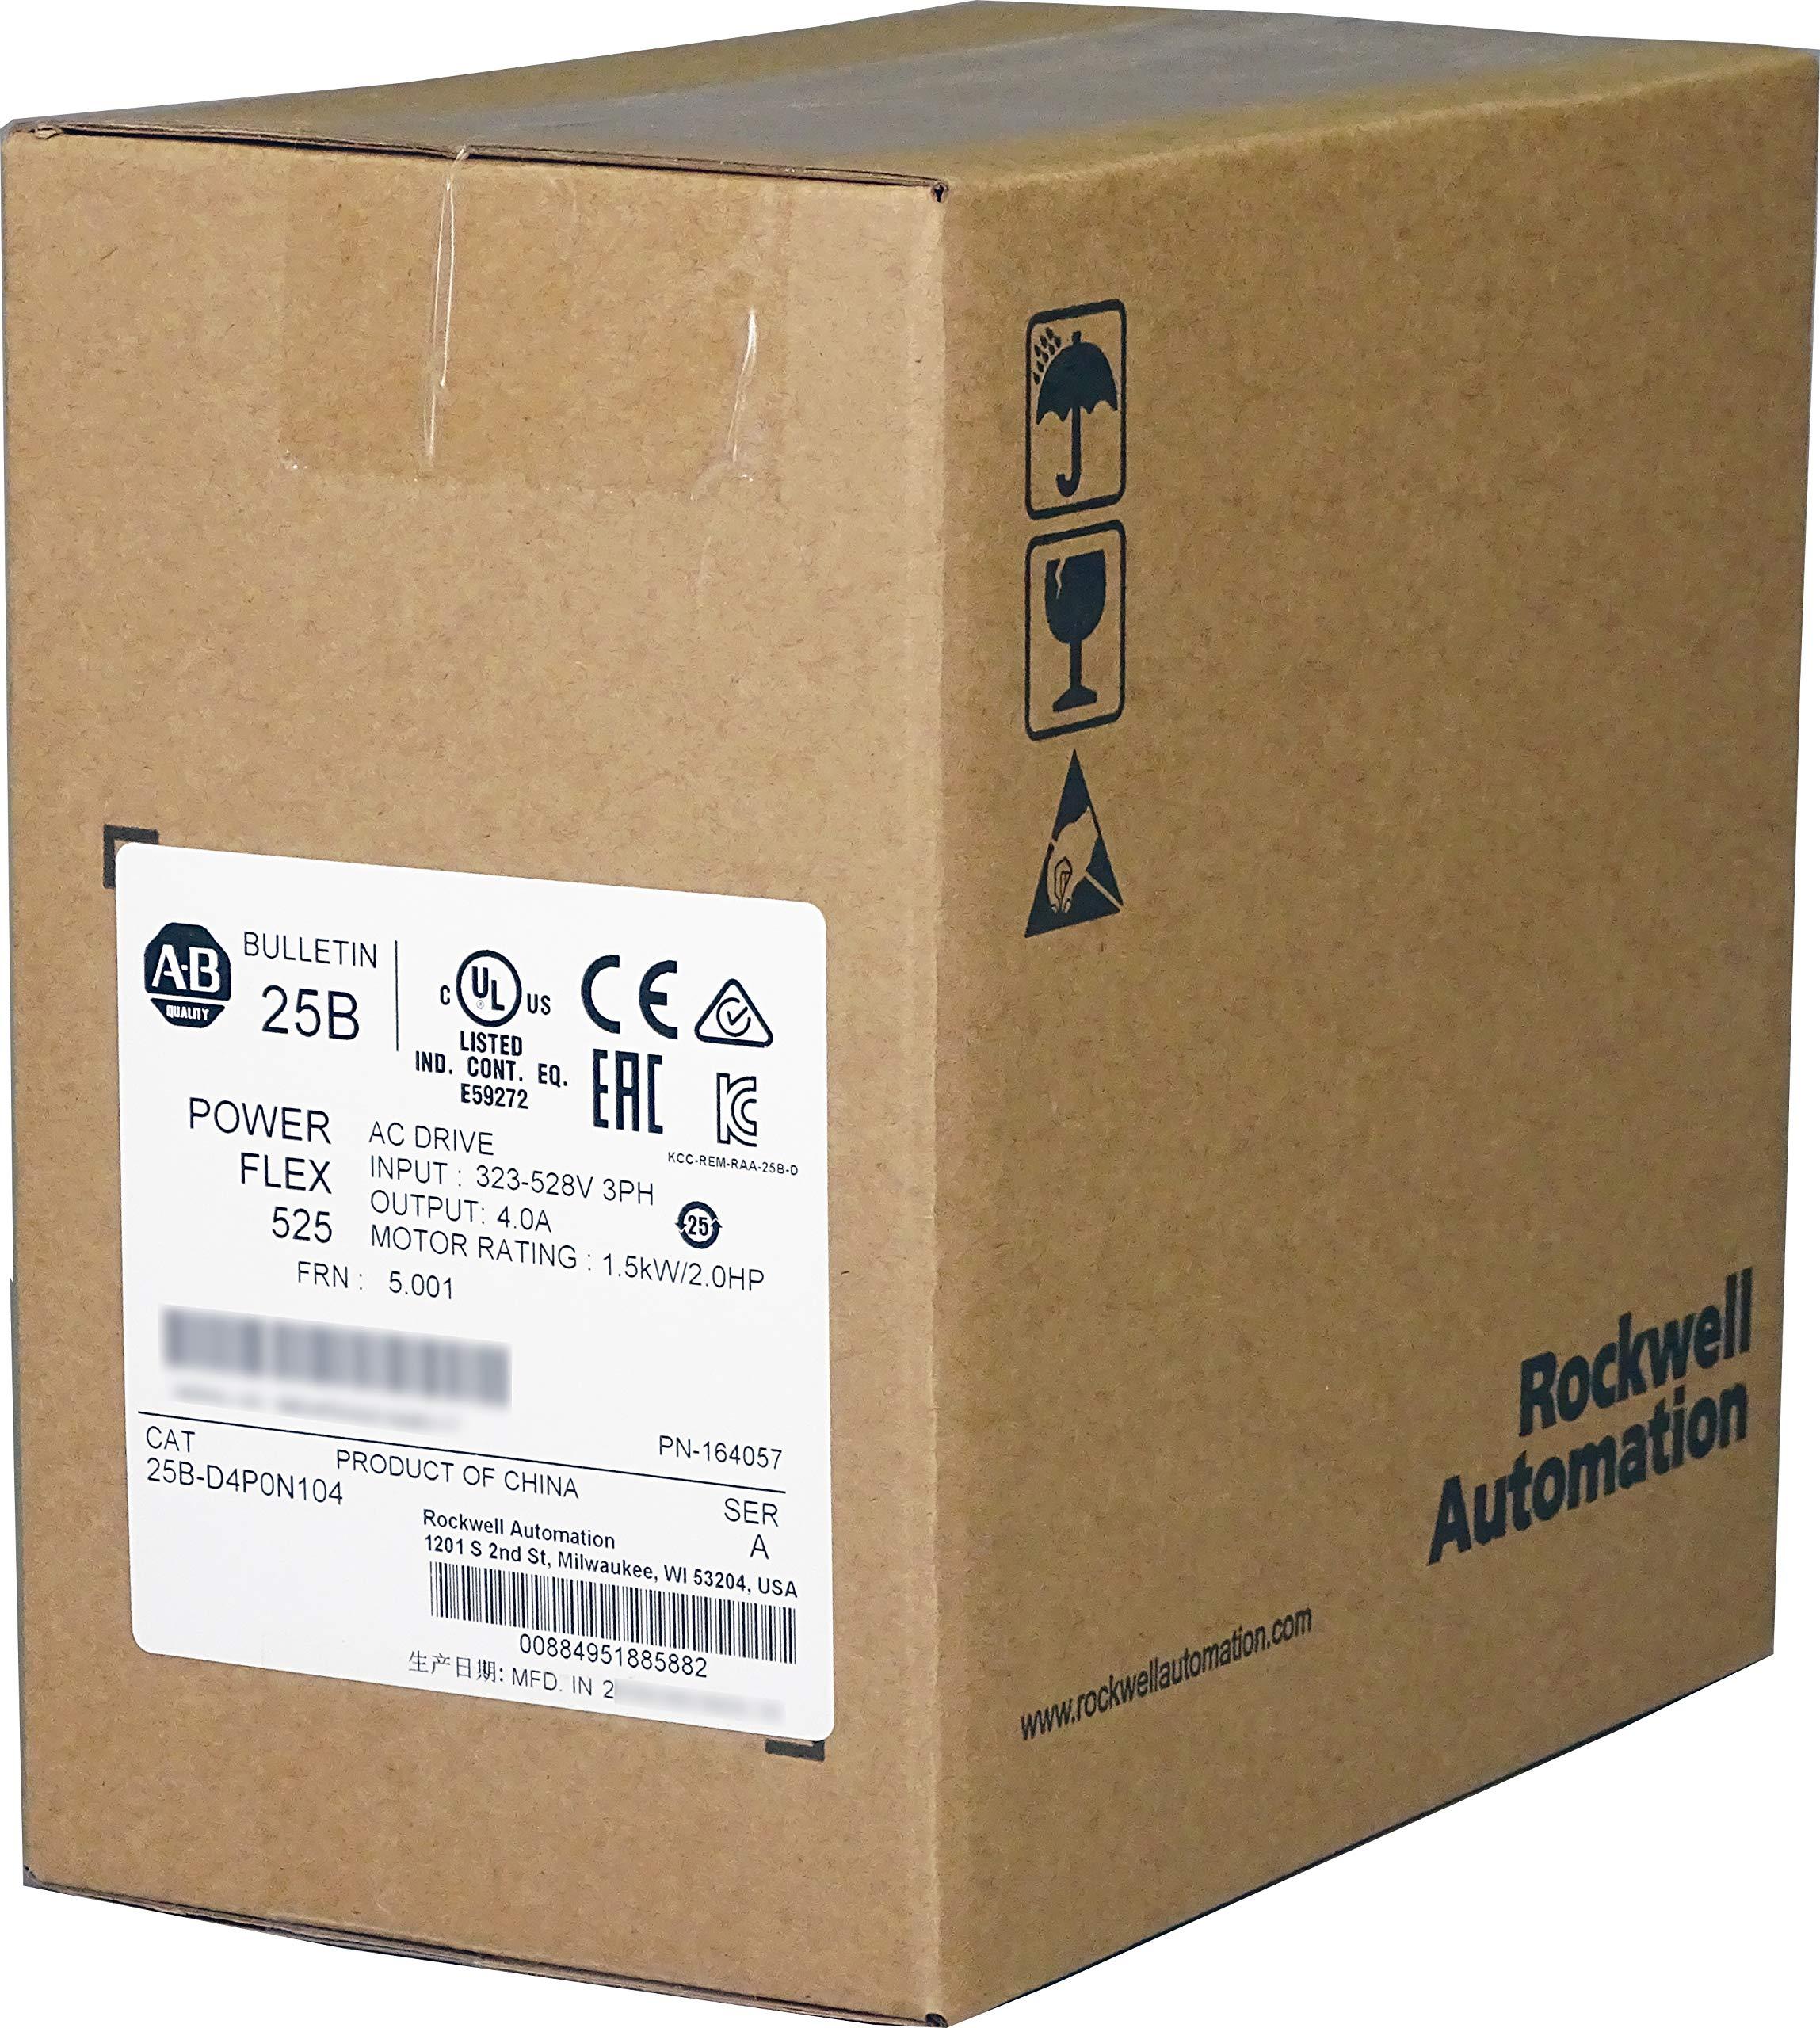 Allen Bradley 25B-D4P0N104 PowerFlex 525 AC Drive, Variable, 480VAC, 2.0HP / 1.5kW, 4.0 Amp, Normal & Heavy Duty Supplied by Industrial Spares by INDUSTRIAL SPARES